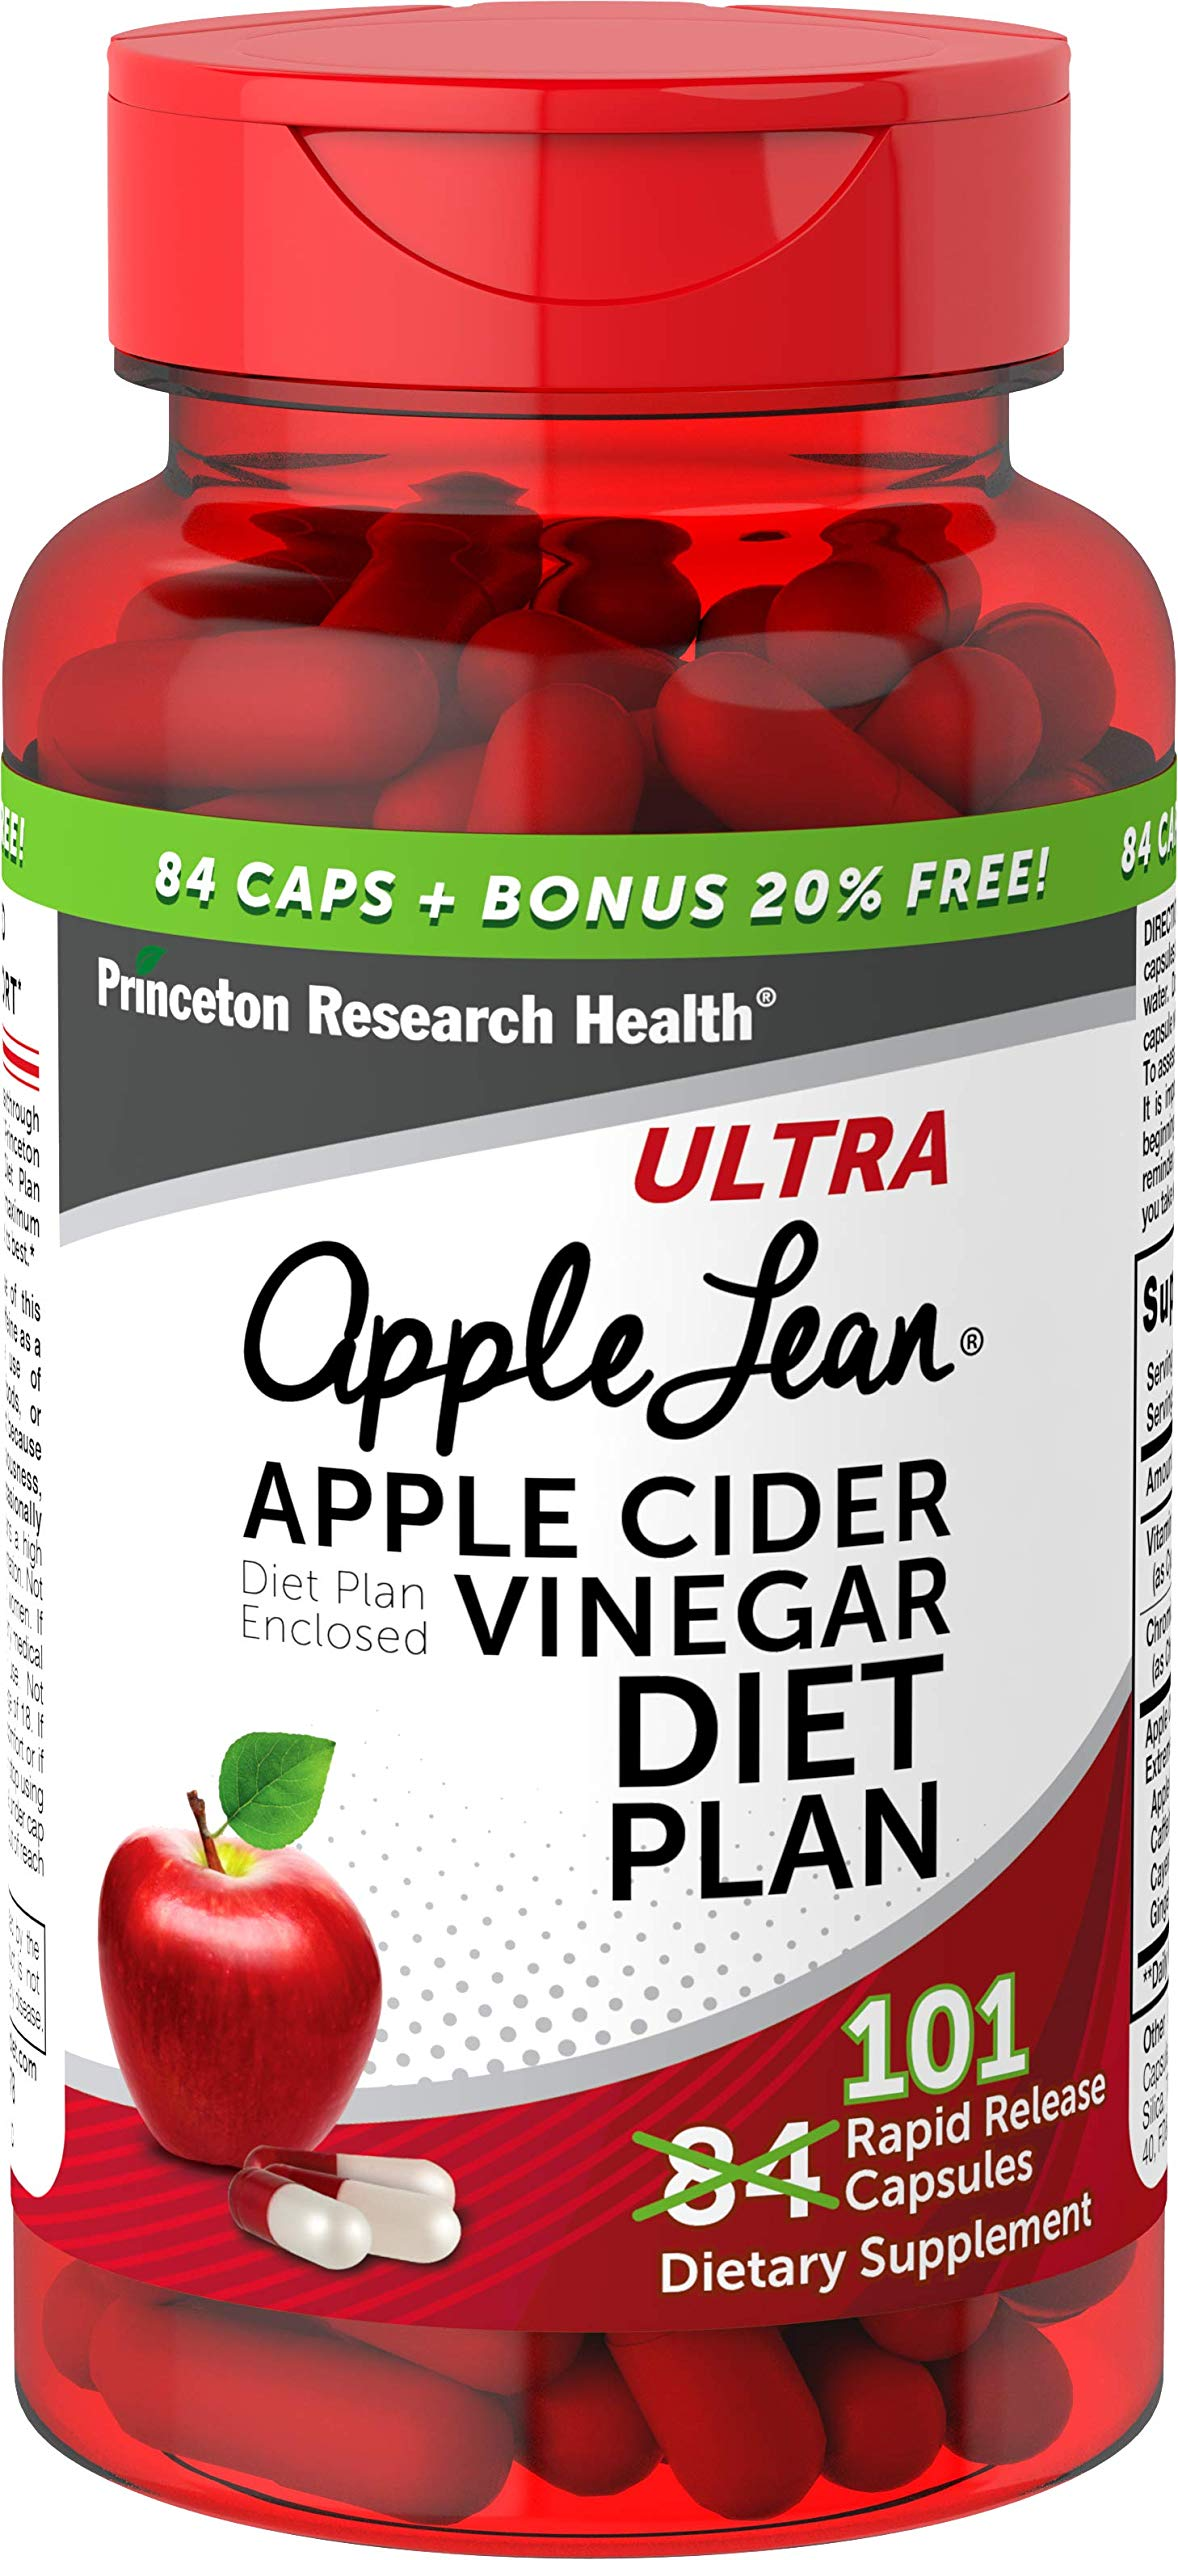 AppleLeanTM Cider Vinegar Diet Complex Supplement, 101 Count by Princeton Research Health